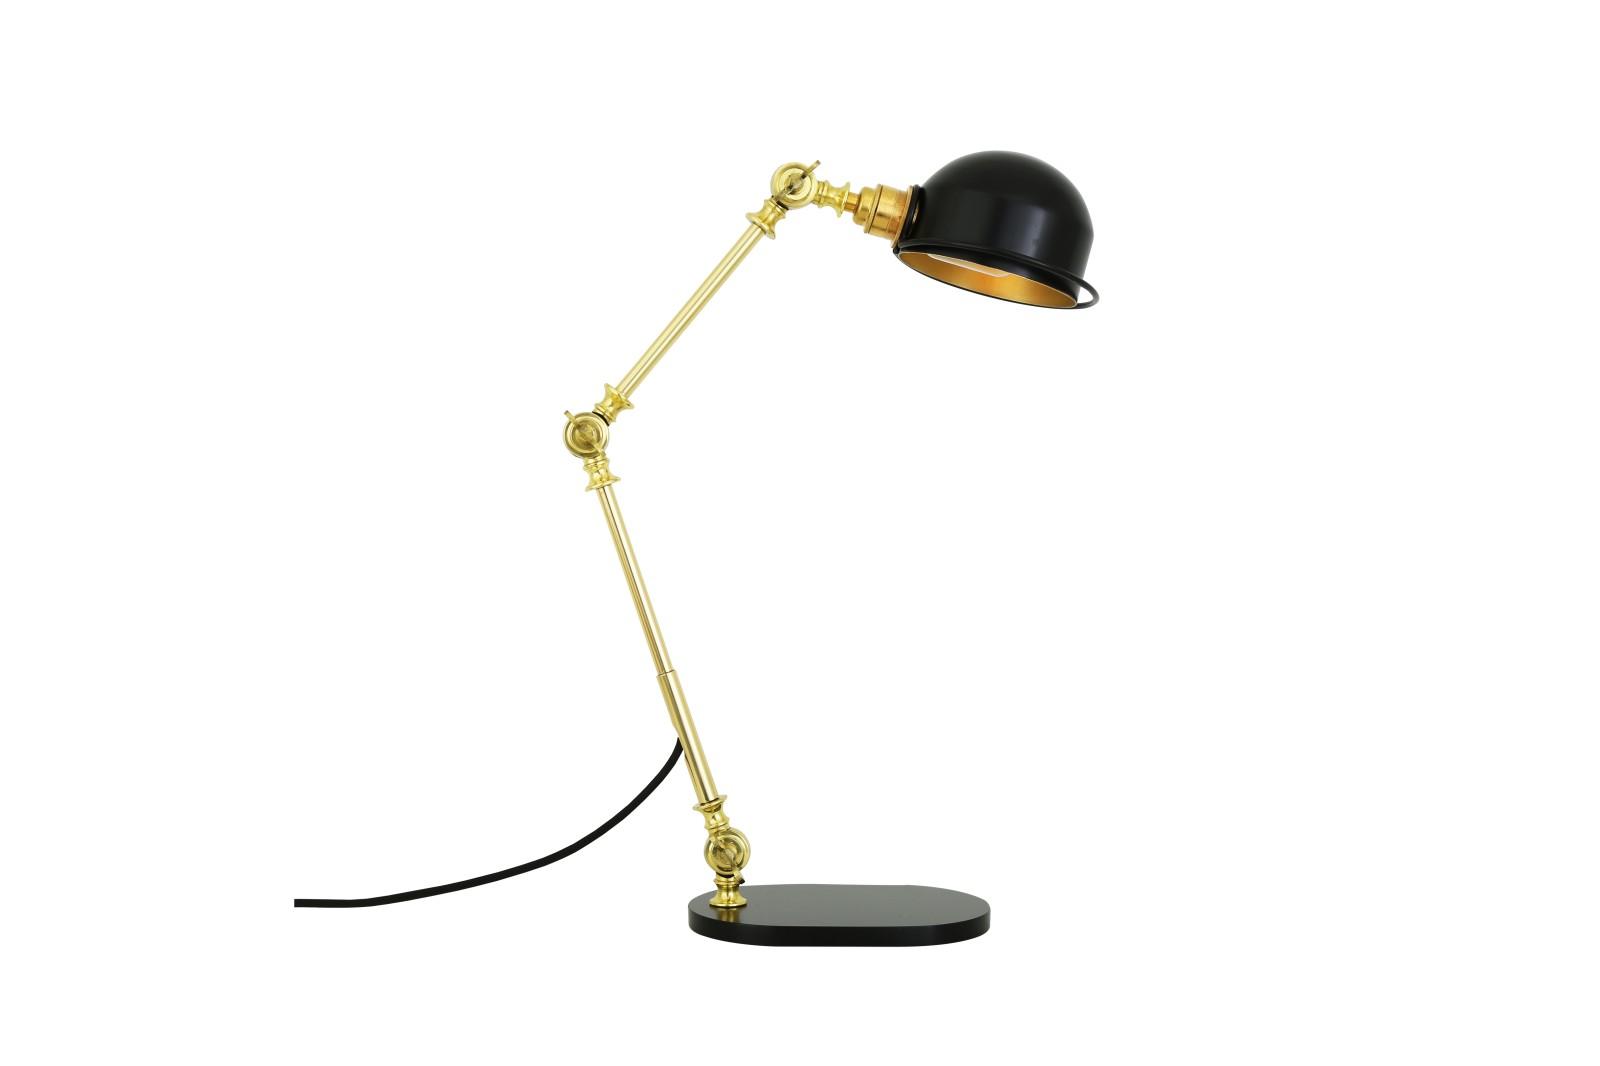 Puhos Table Lamp Powder Coated Matte Black & Polished Brass, EU Plug